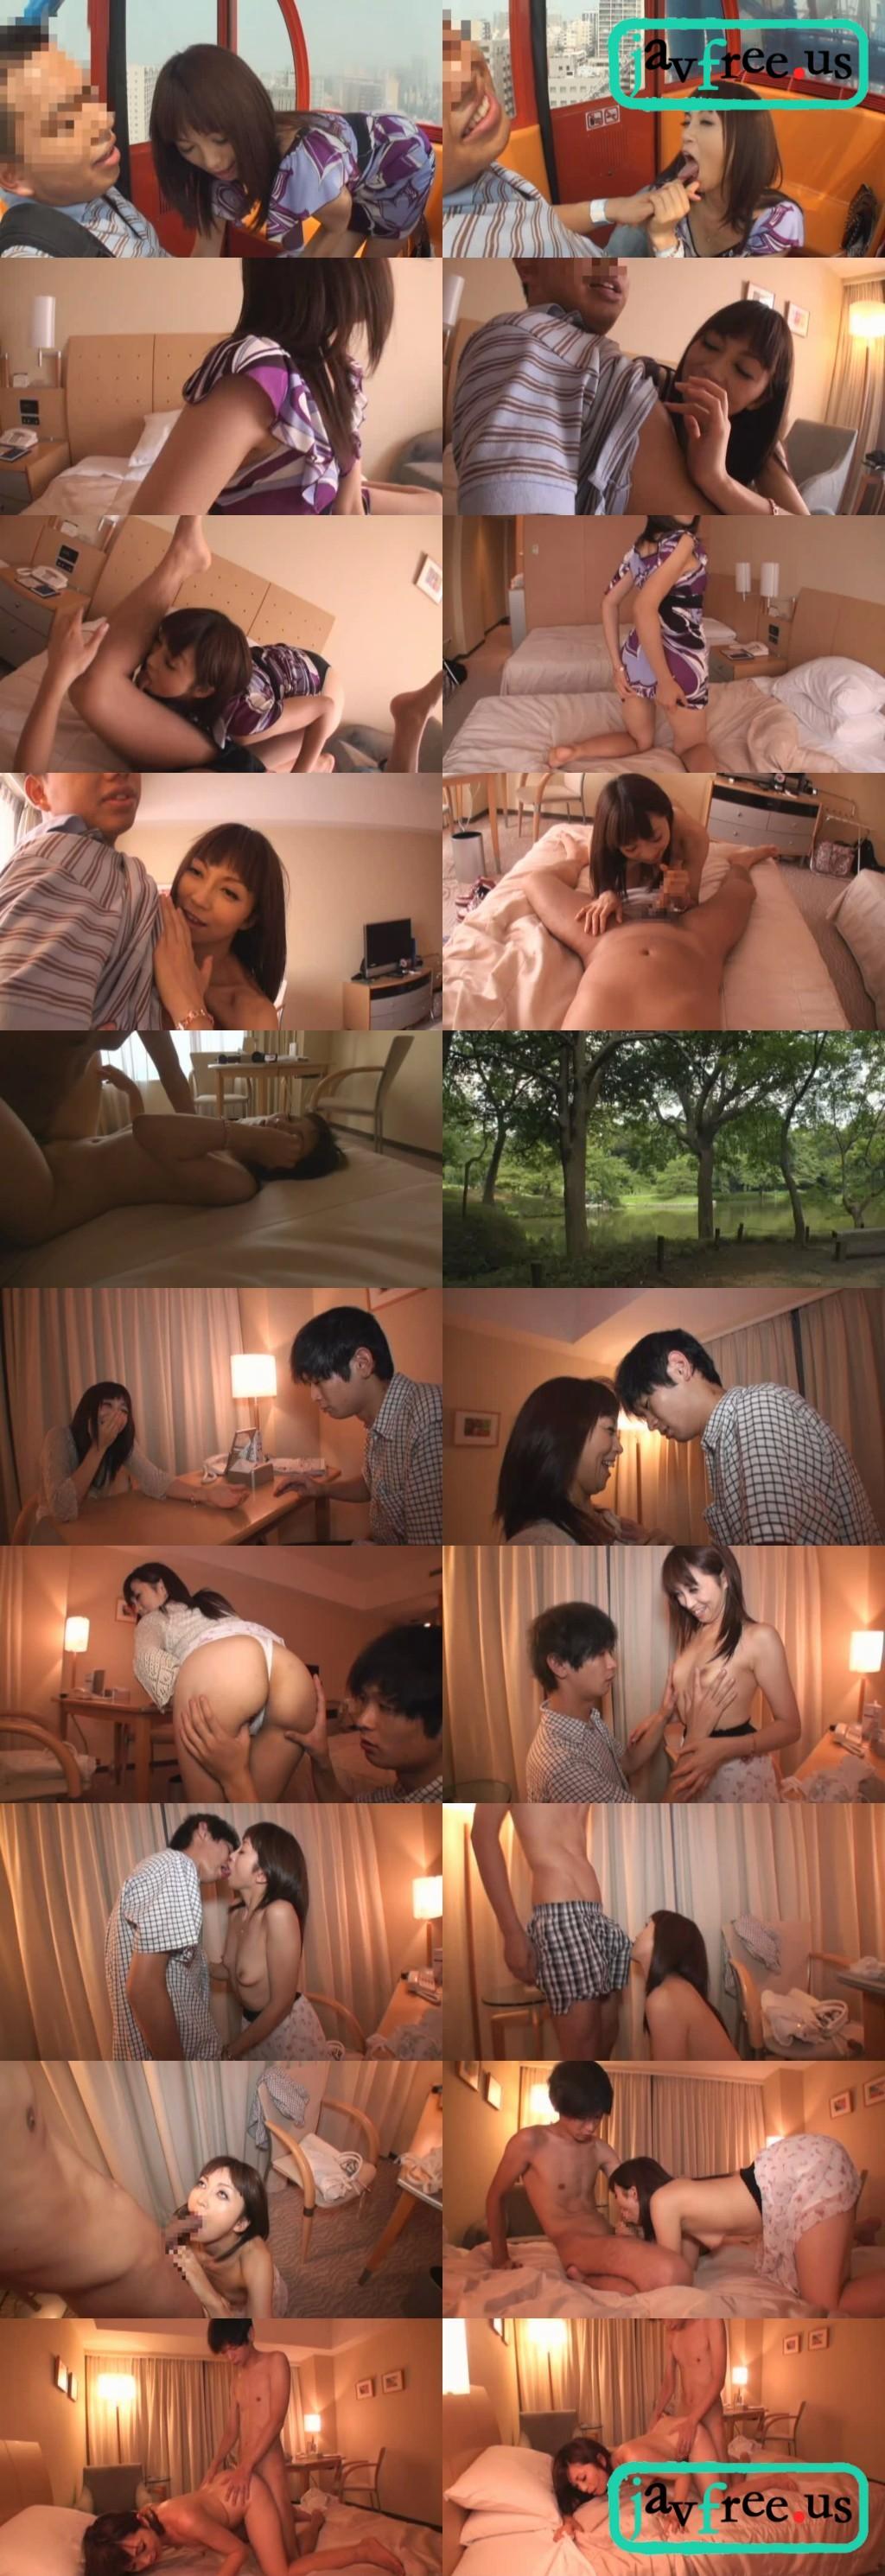 [KK 086] Hなオバサンとヒモの接吻デート 新尾きり子 新尾きり子 KK